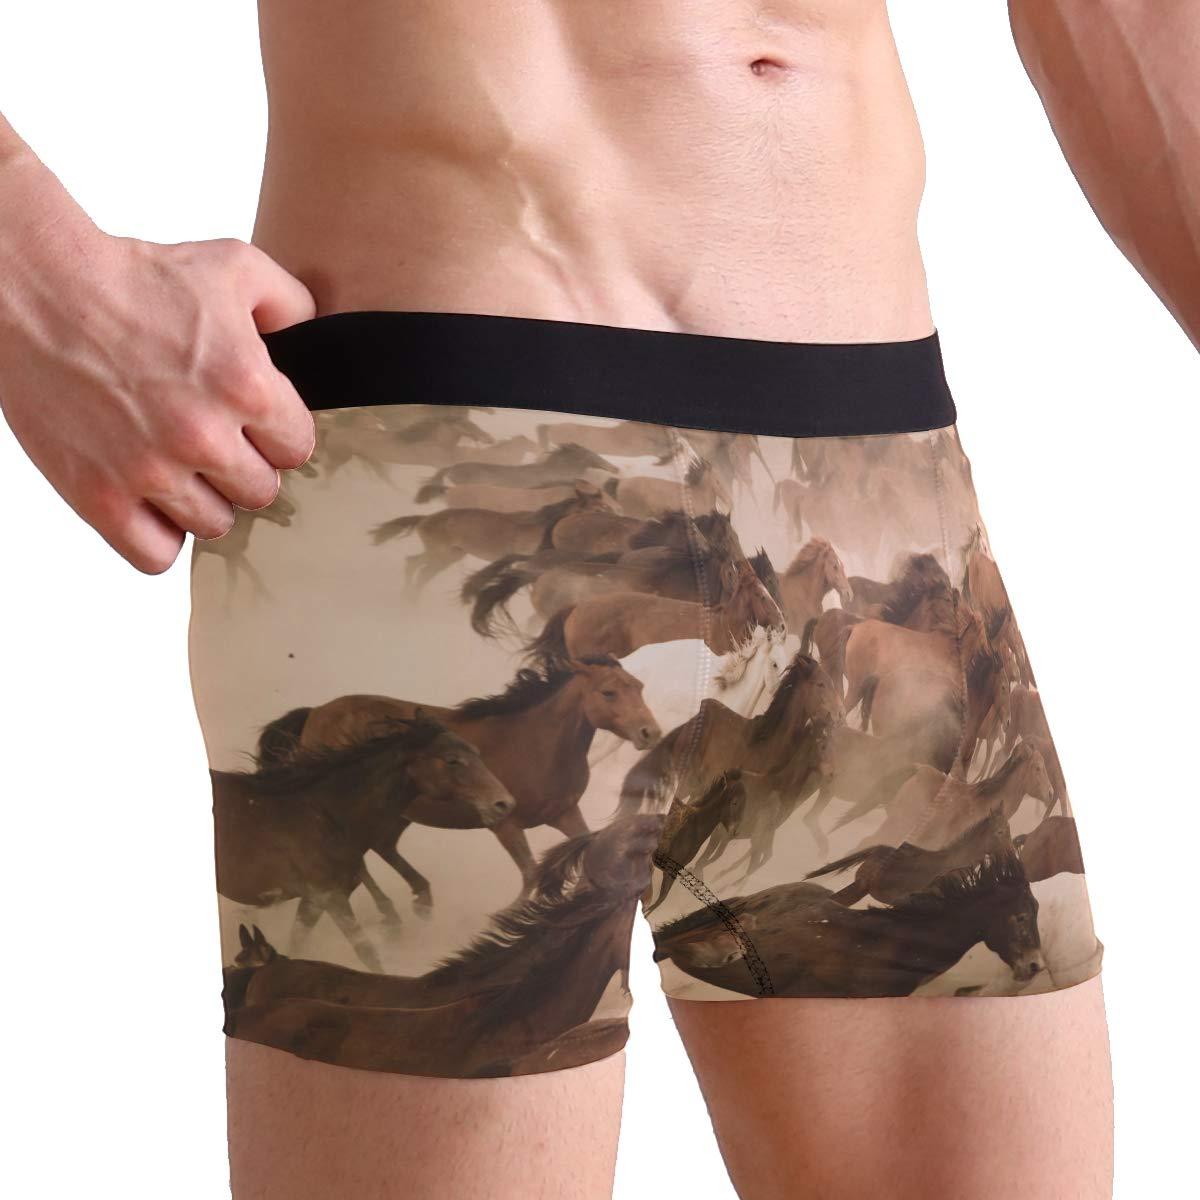 ZZKKO Running Horse Mens Boxer Briefs Underwear Breathable Stretch Boxer Trunk with Pouch S-XL